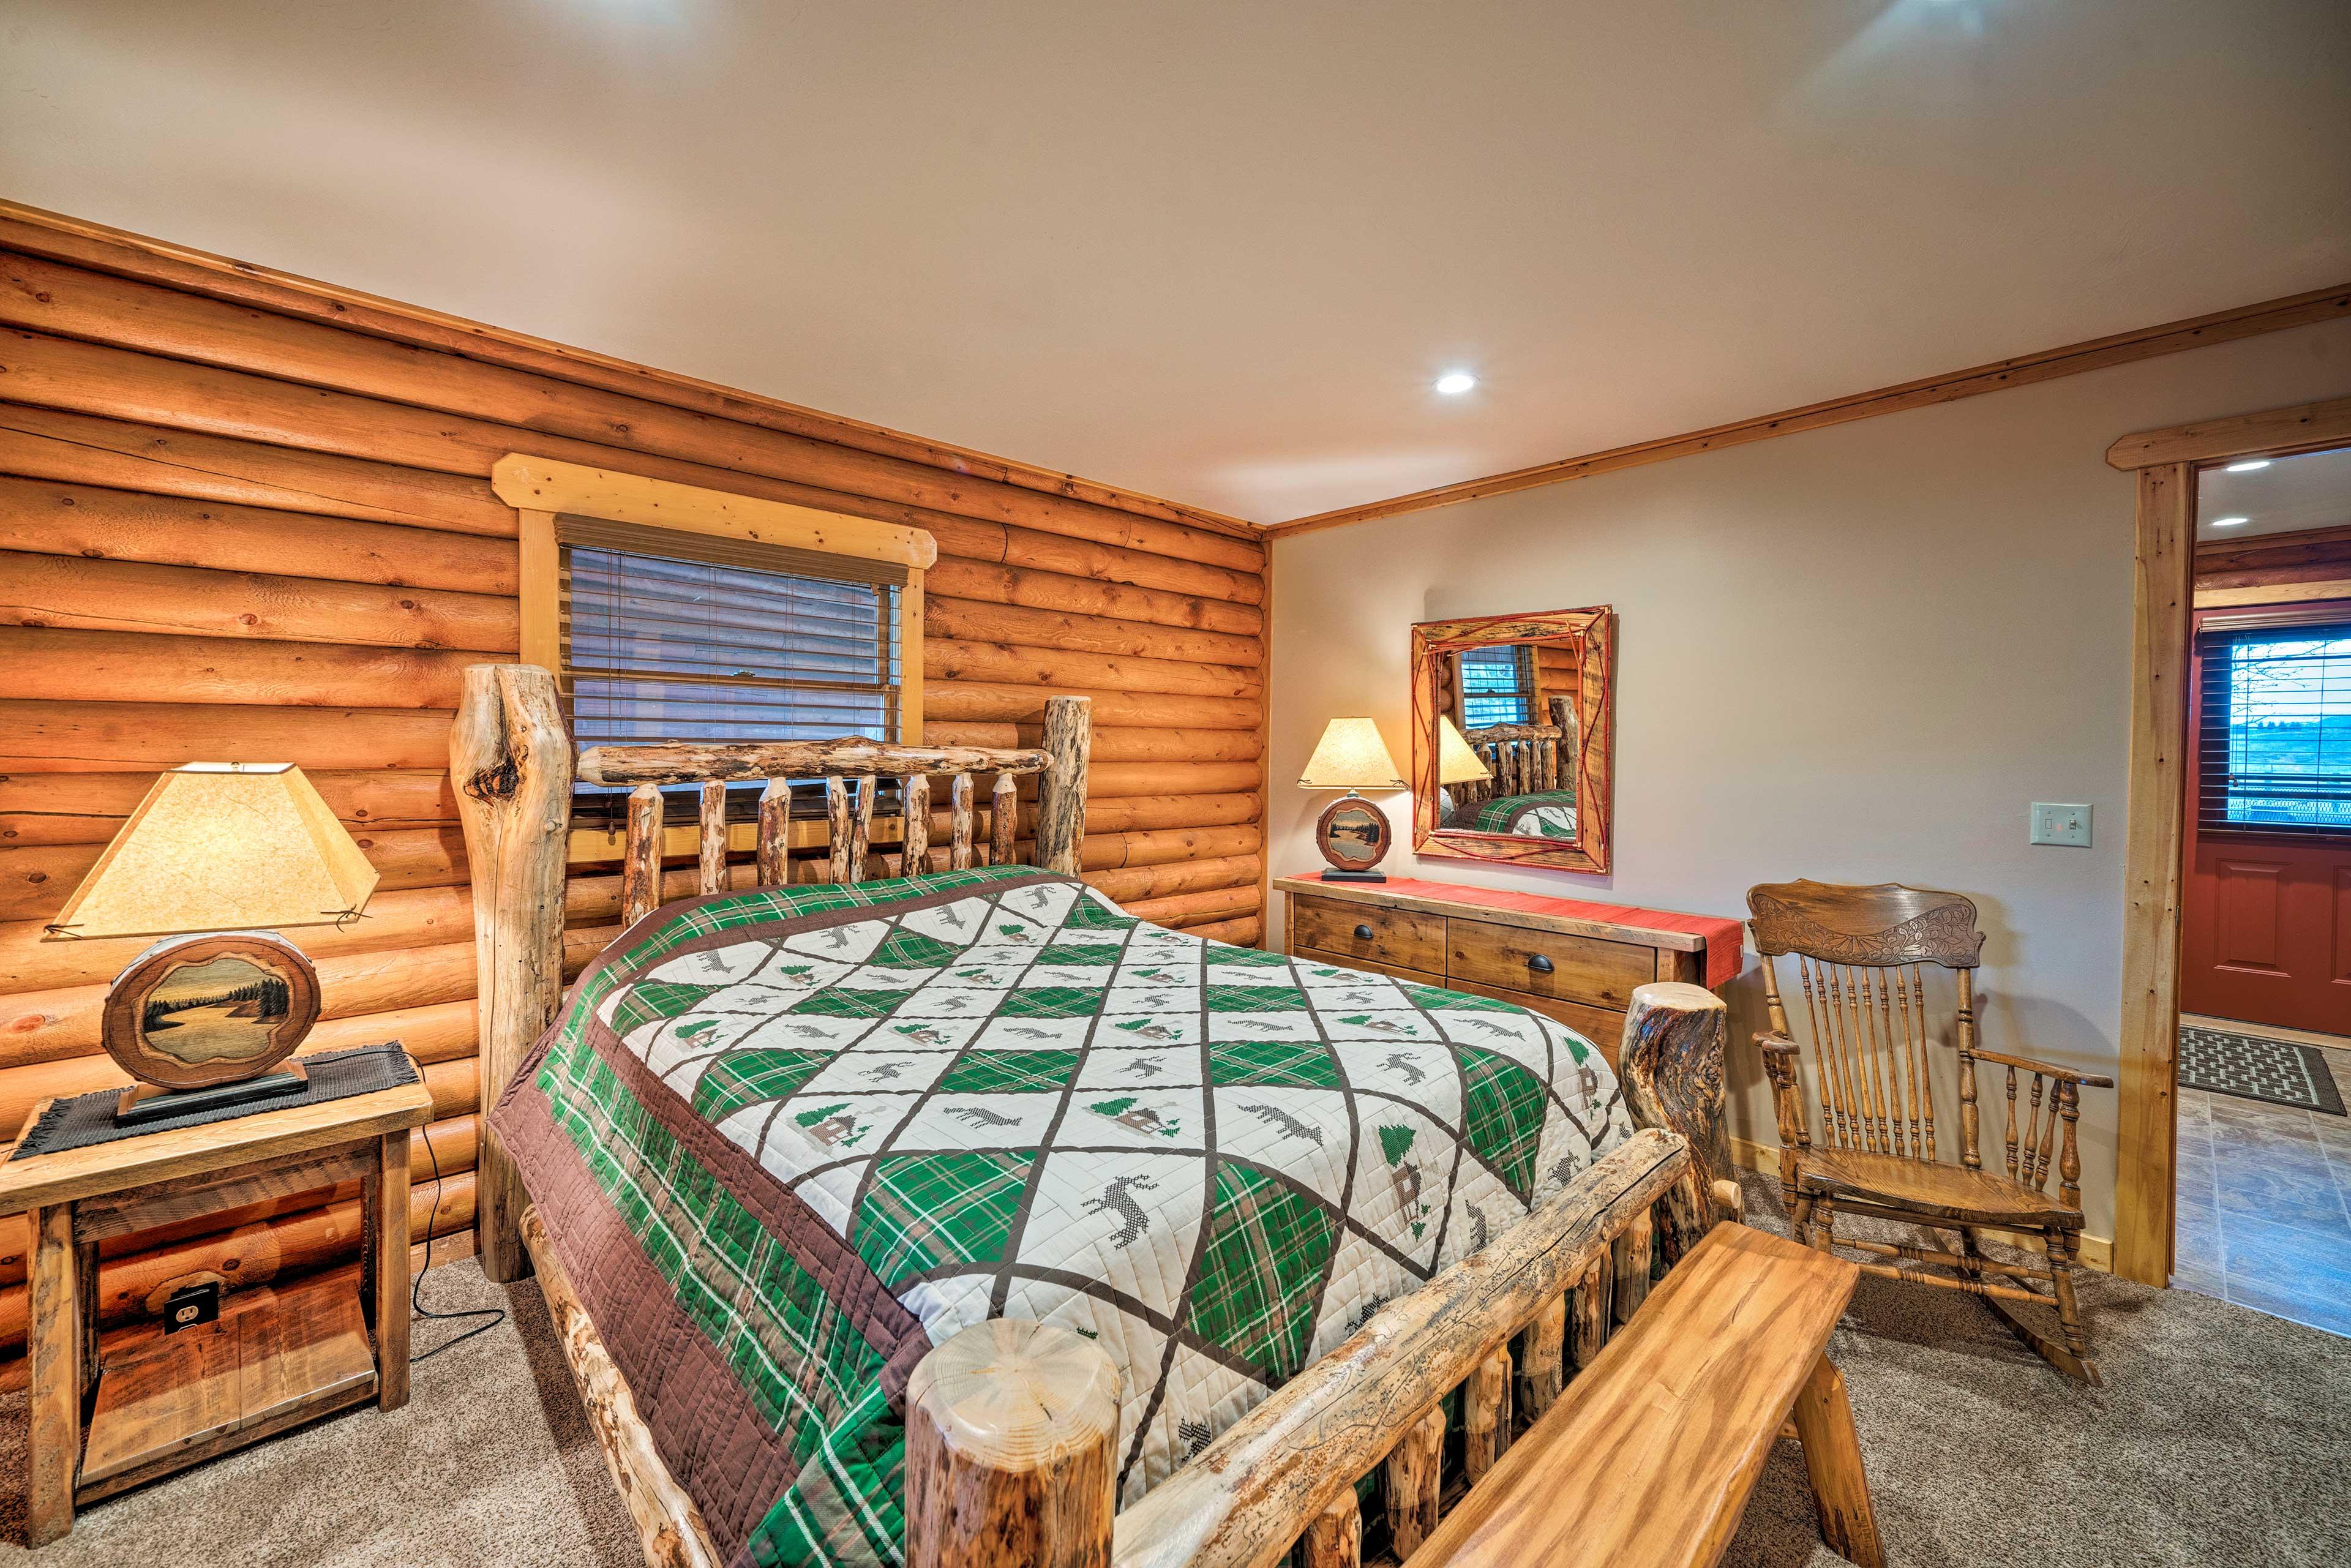 Sleep soundly in the log-framed bed.